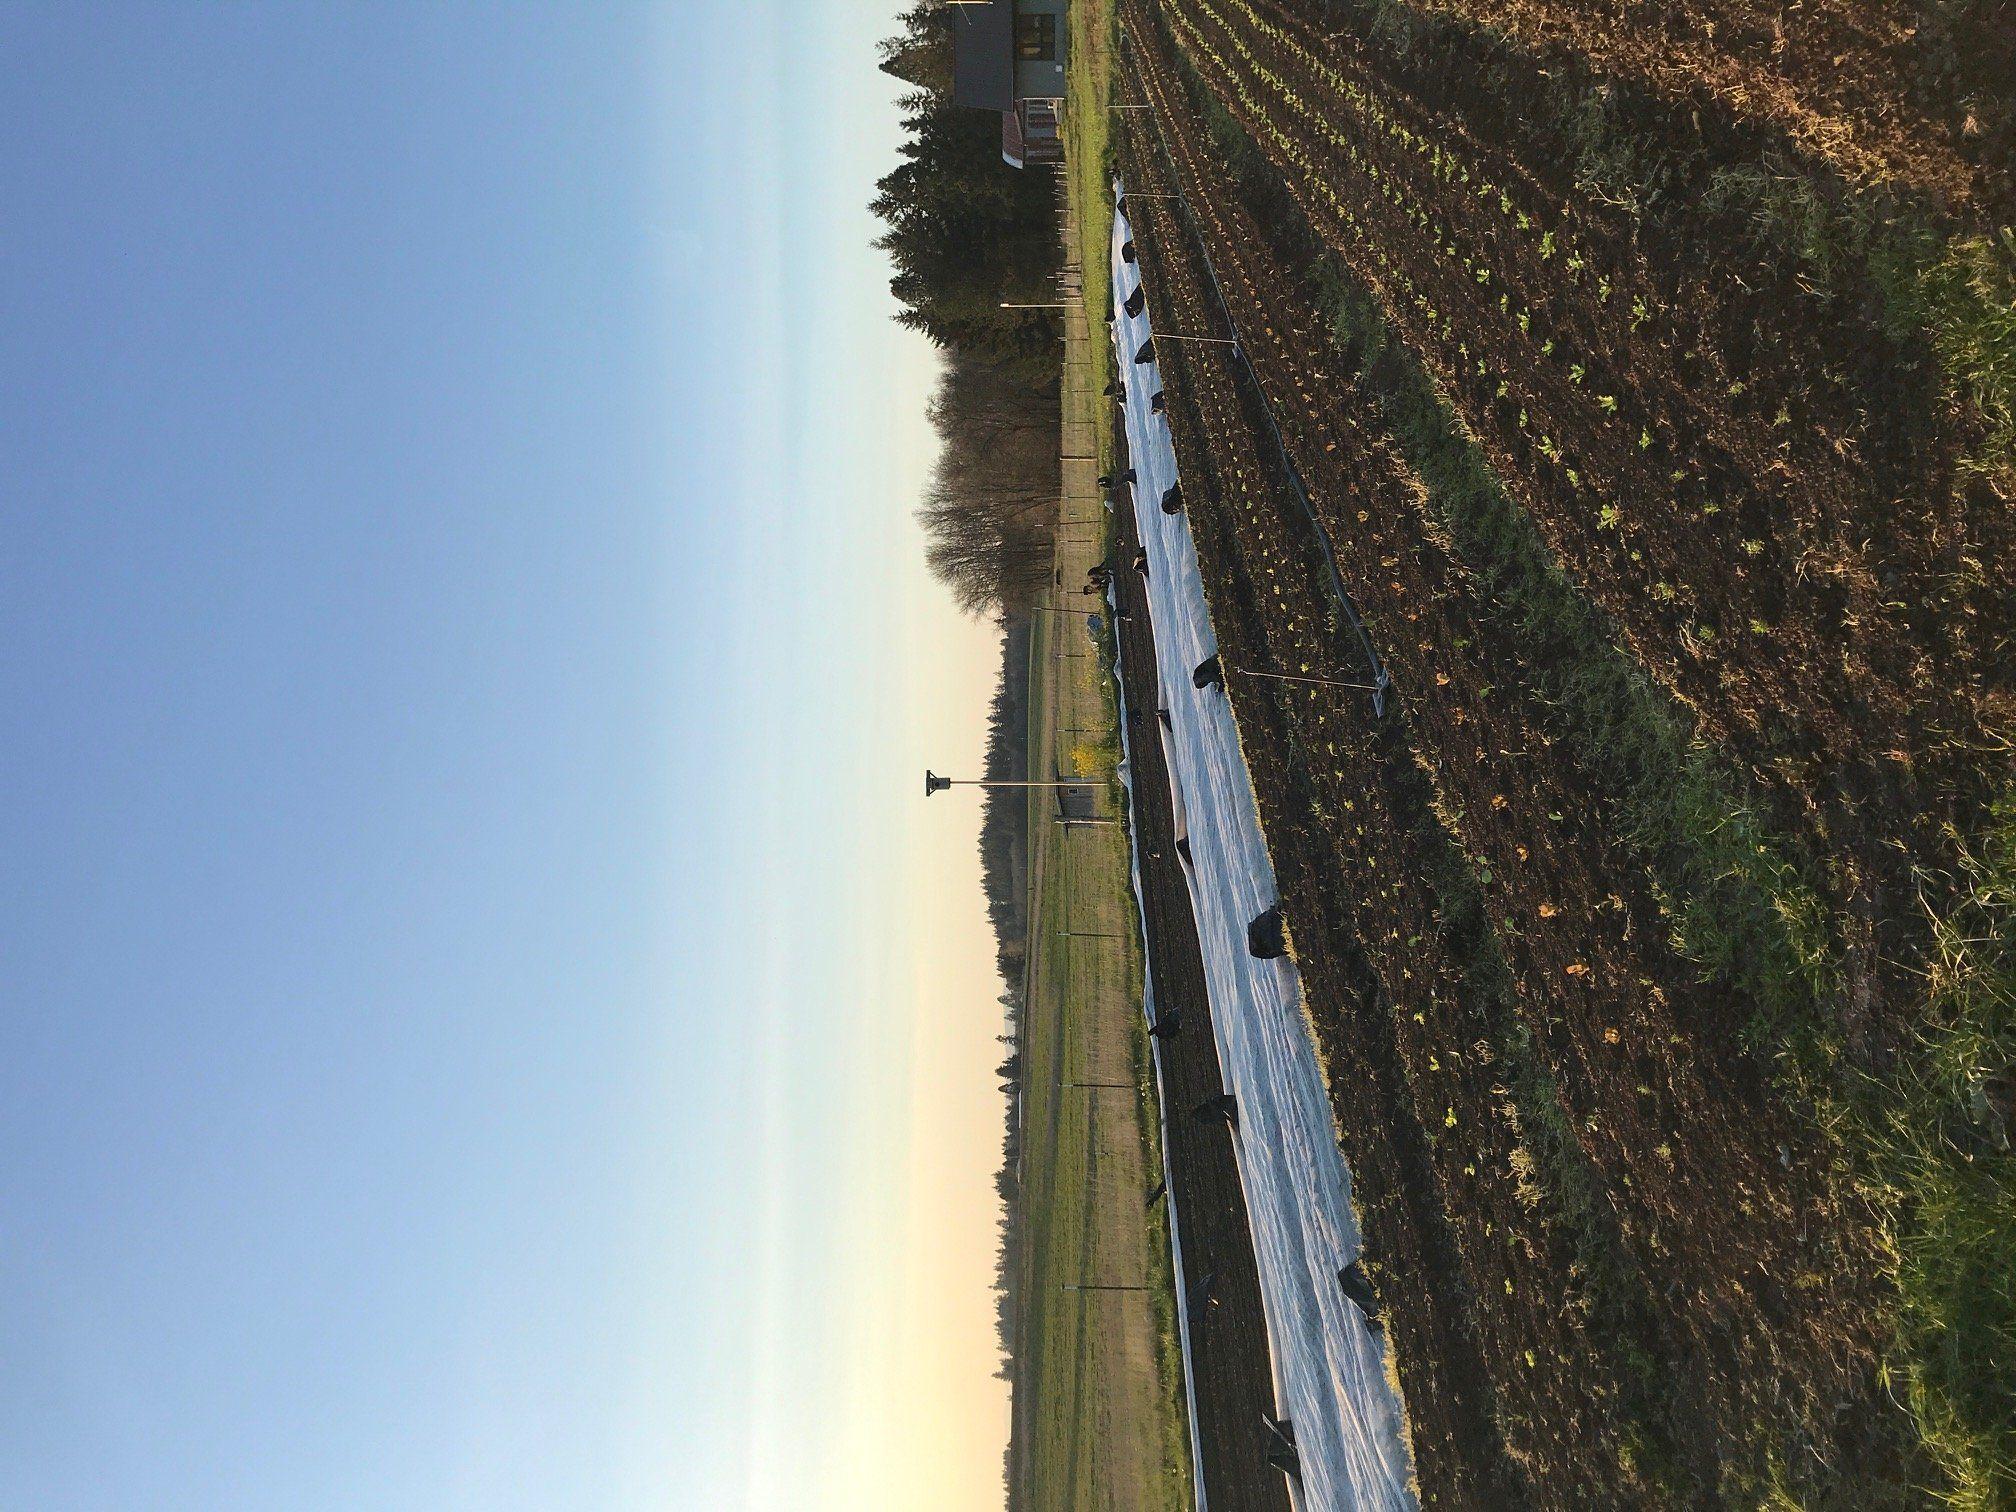 Farm Happenings for April 11, 2020